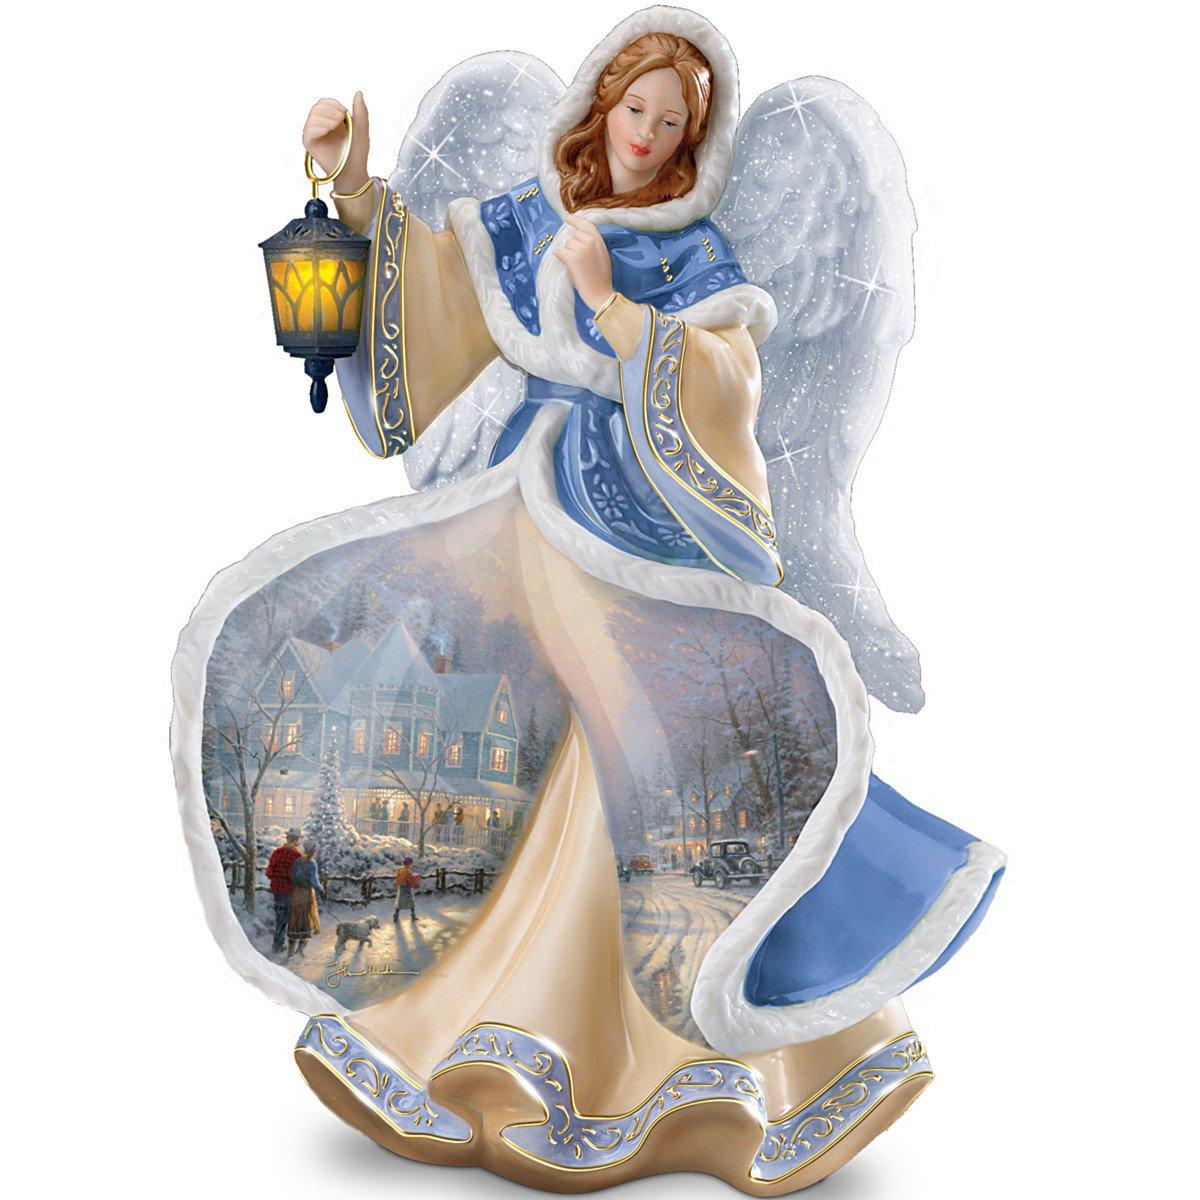 Festive Holiday angel figurines